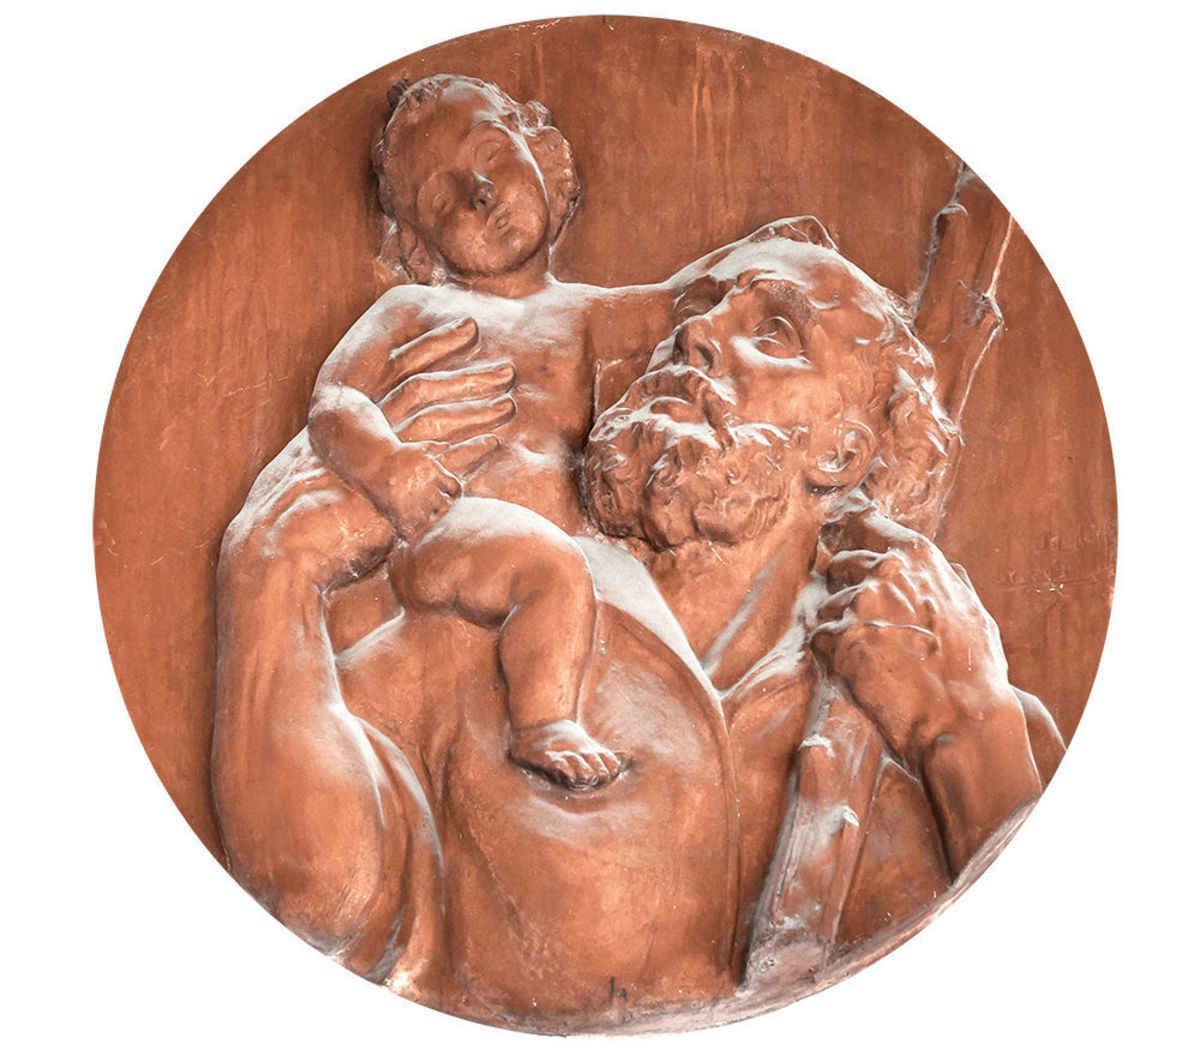 Stolen Jesus, Mary returned to Bancroft nativity scene